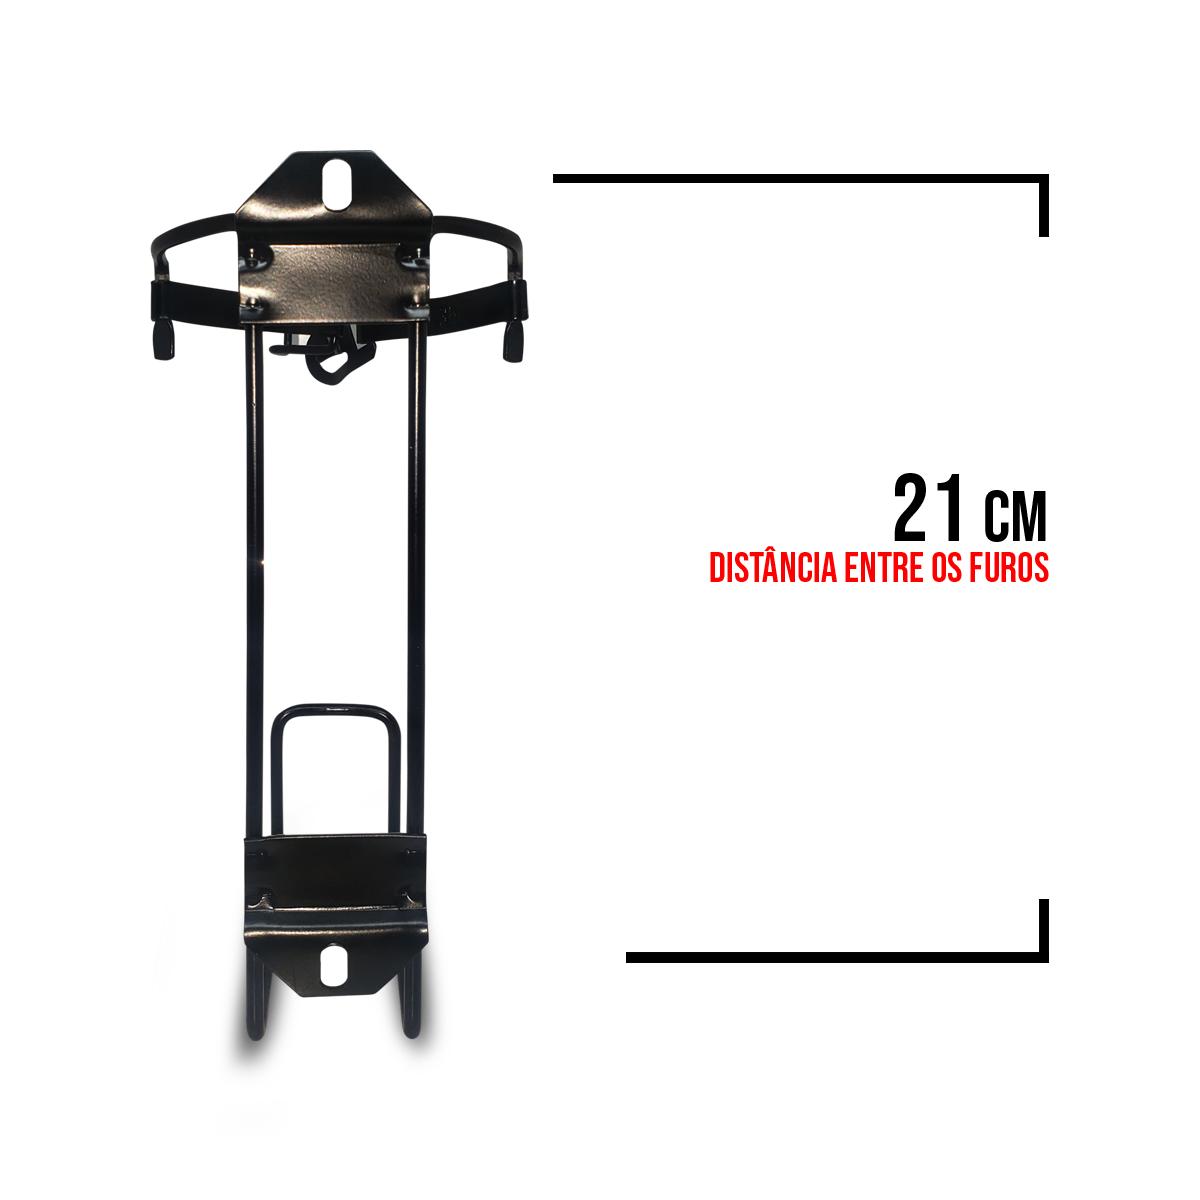 Extintor ABC 02kgs C/Suporte - Vans, Caminhões - Val. 5 Anos